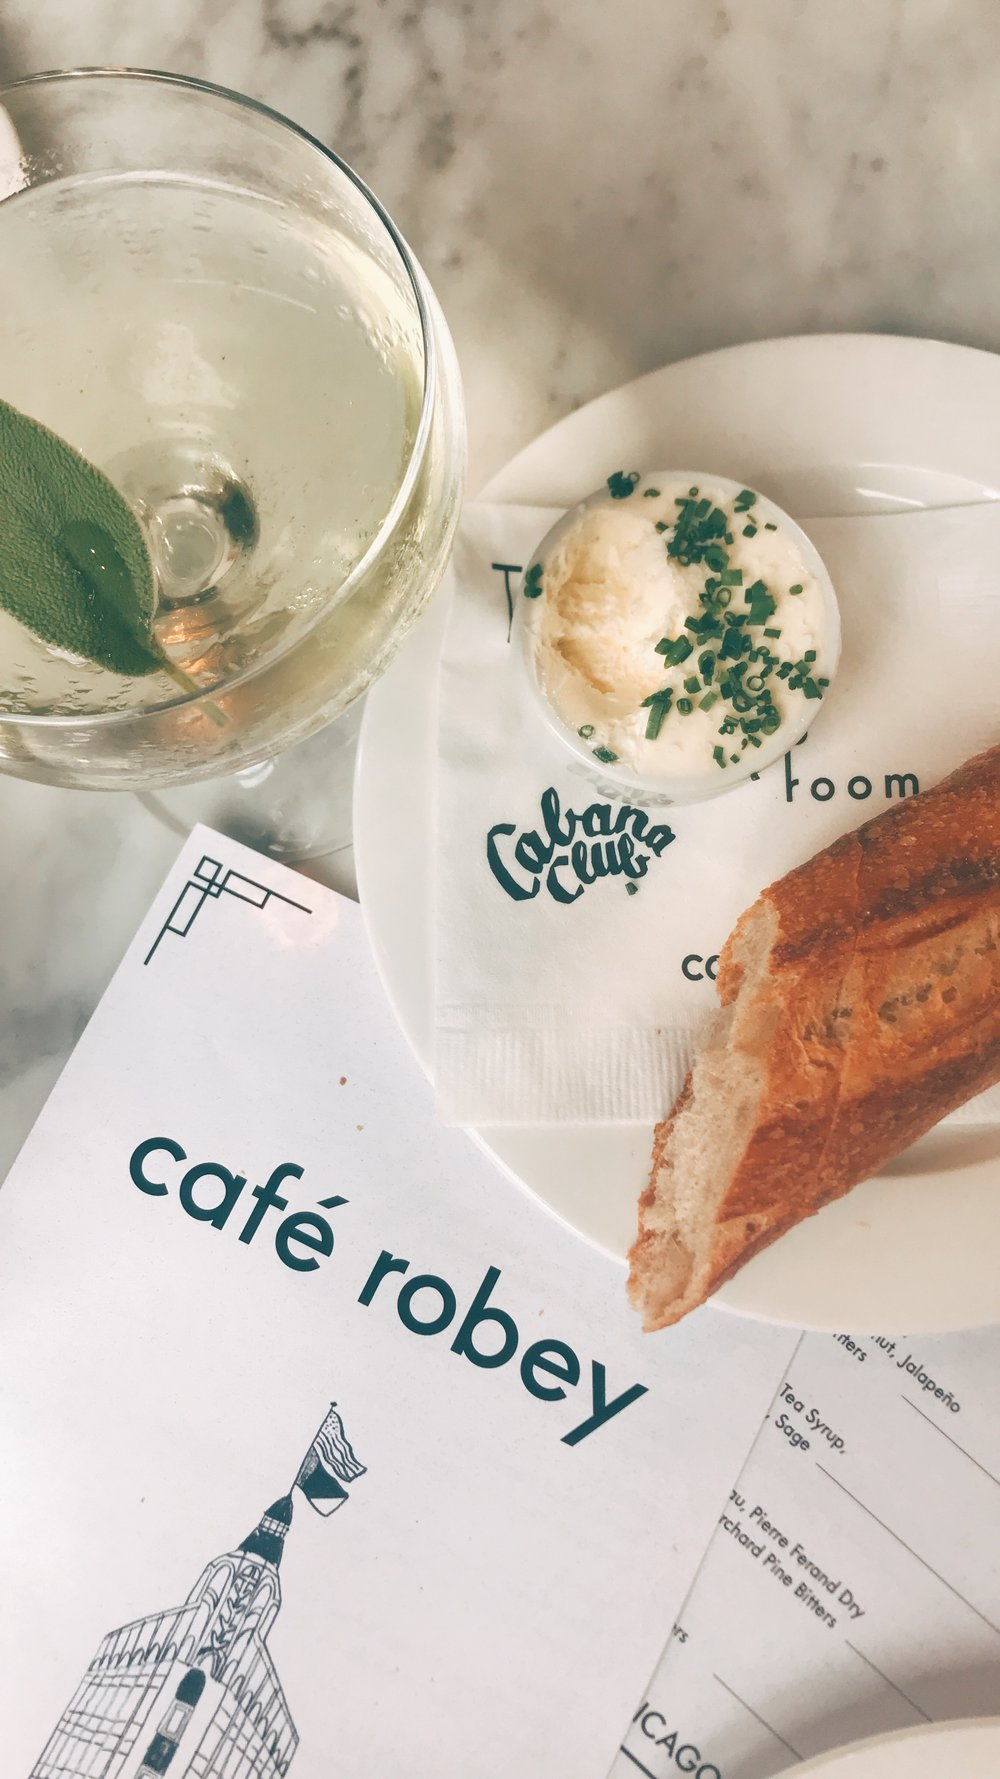 CAFÉ ROBEY